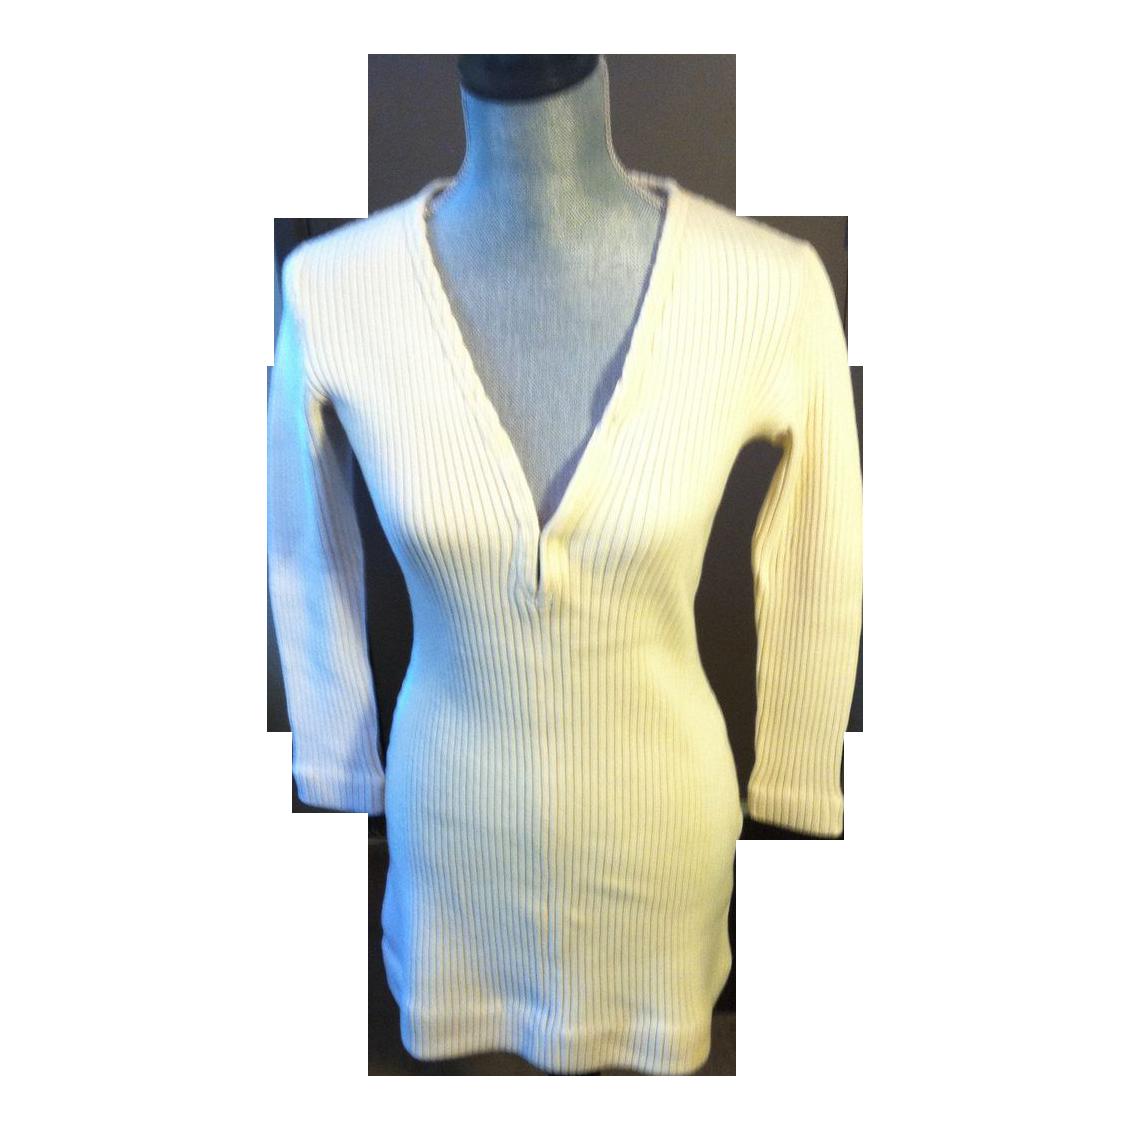 Vintage Rudi Gernreich Wool Knit Dress - FABULOUS!